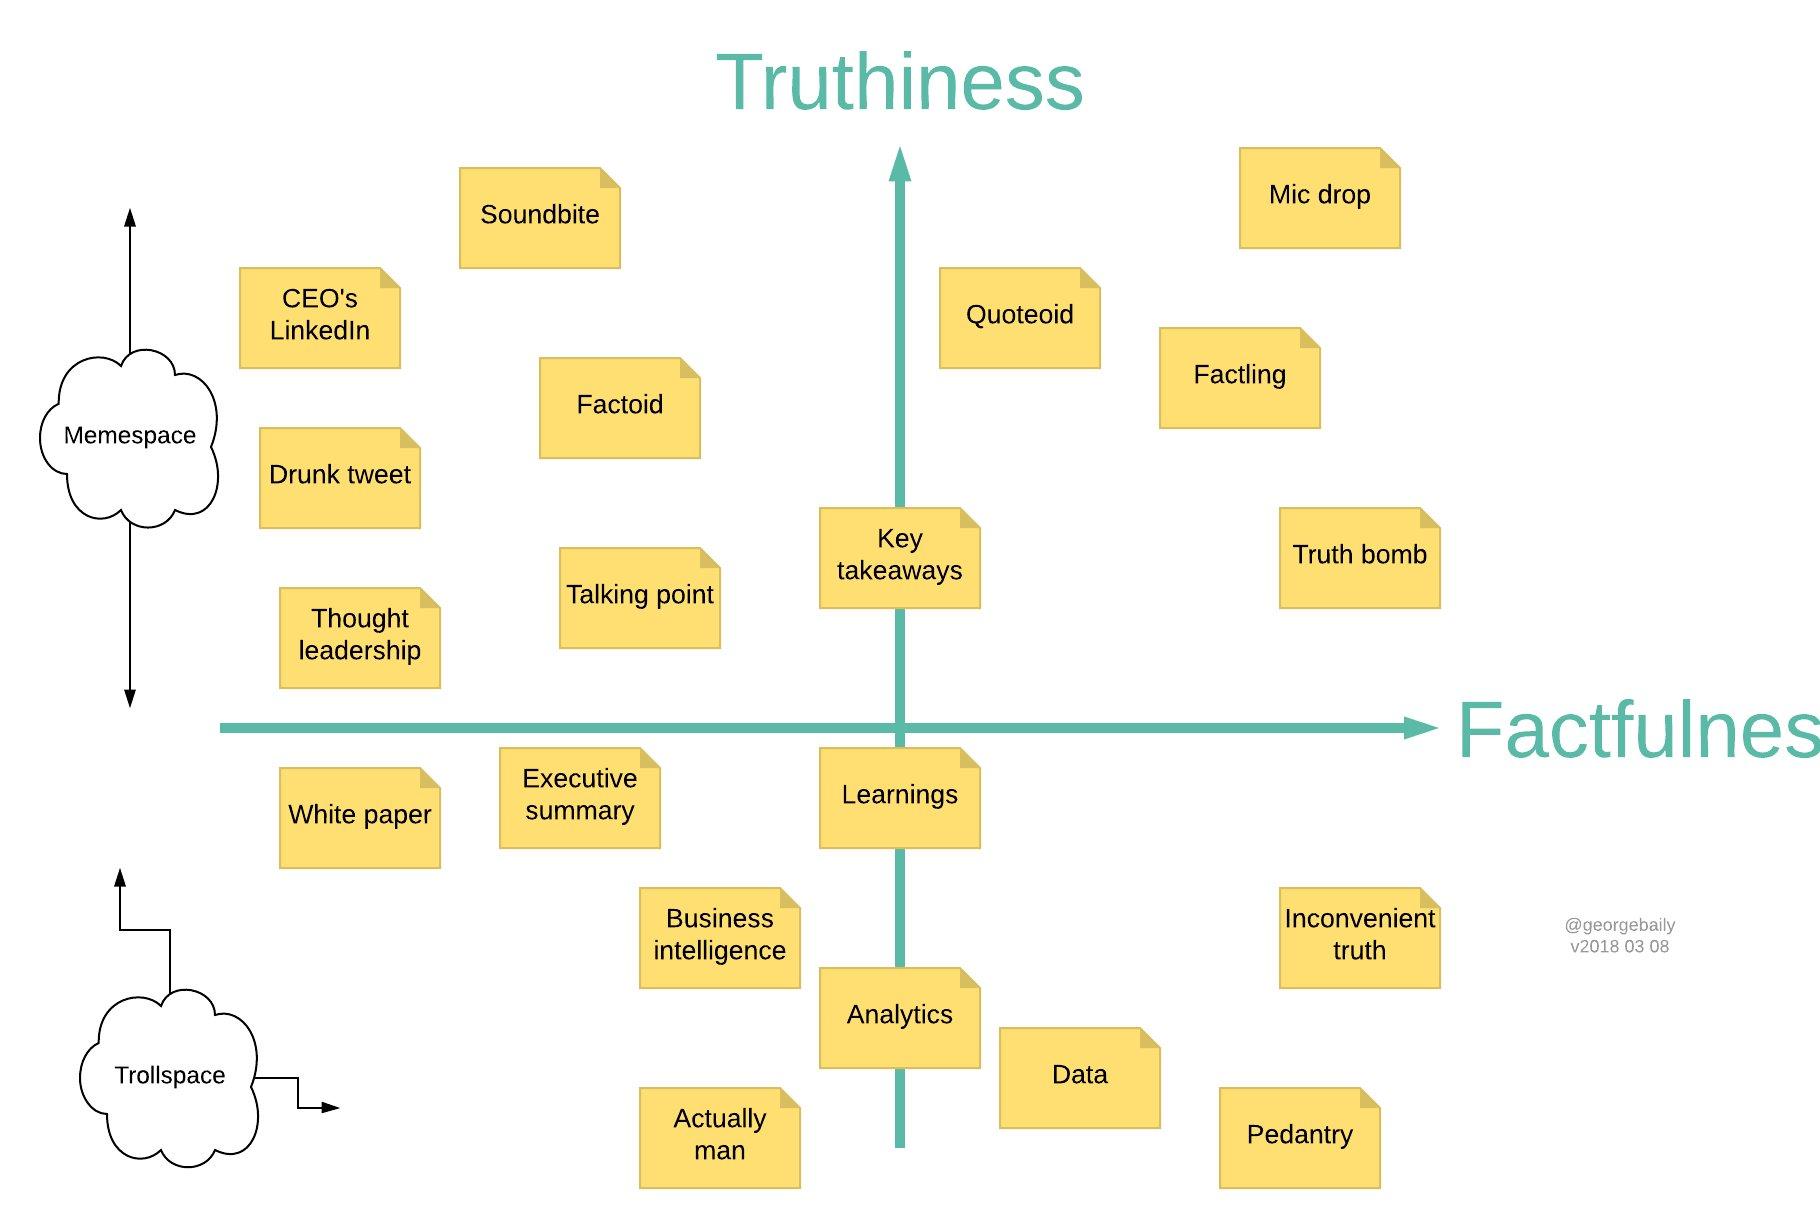 quadrant on truthiness vs factfulness